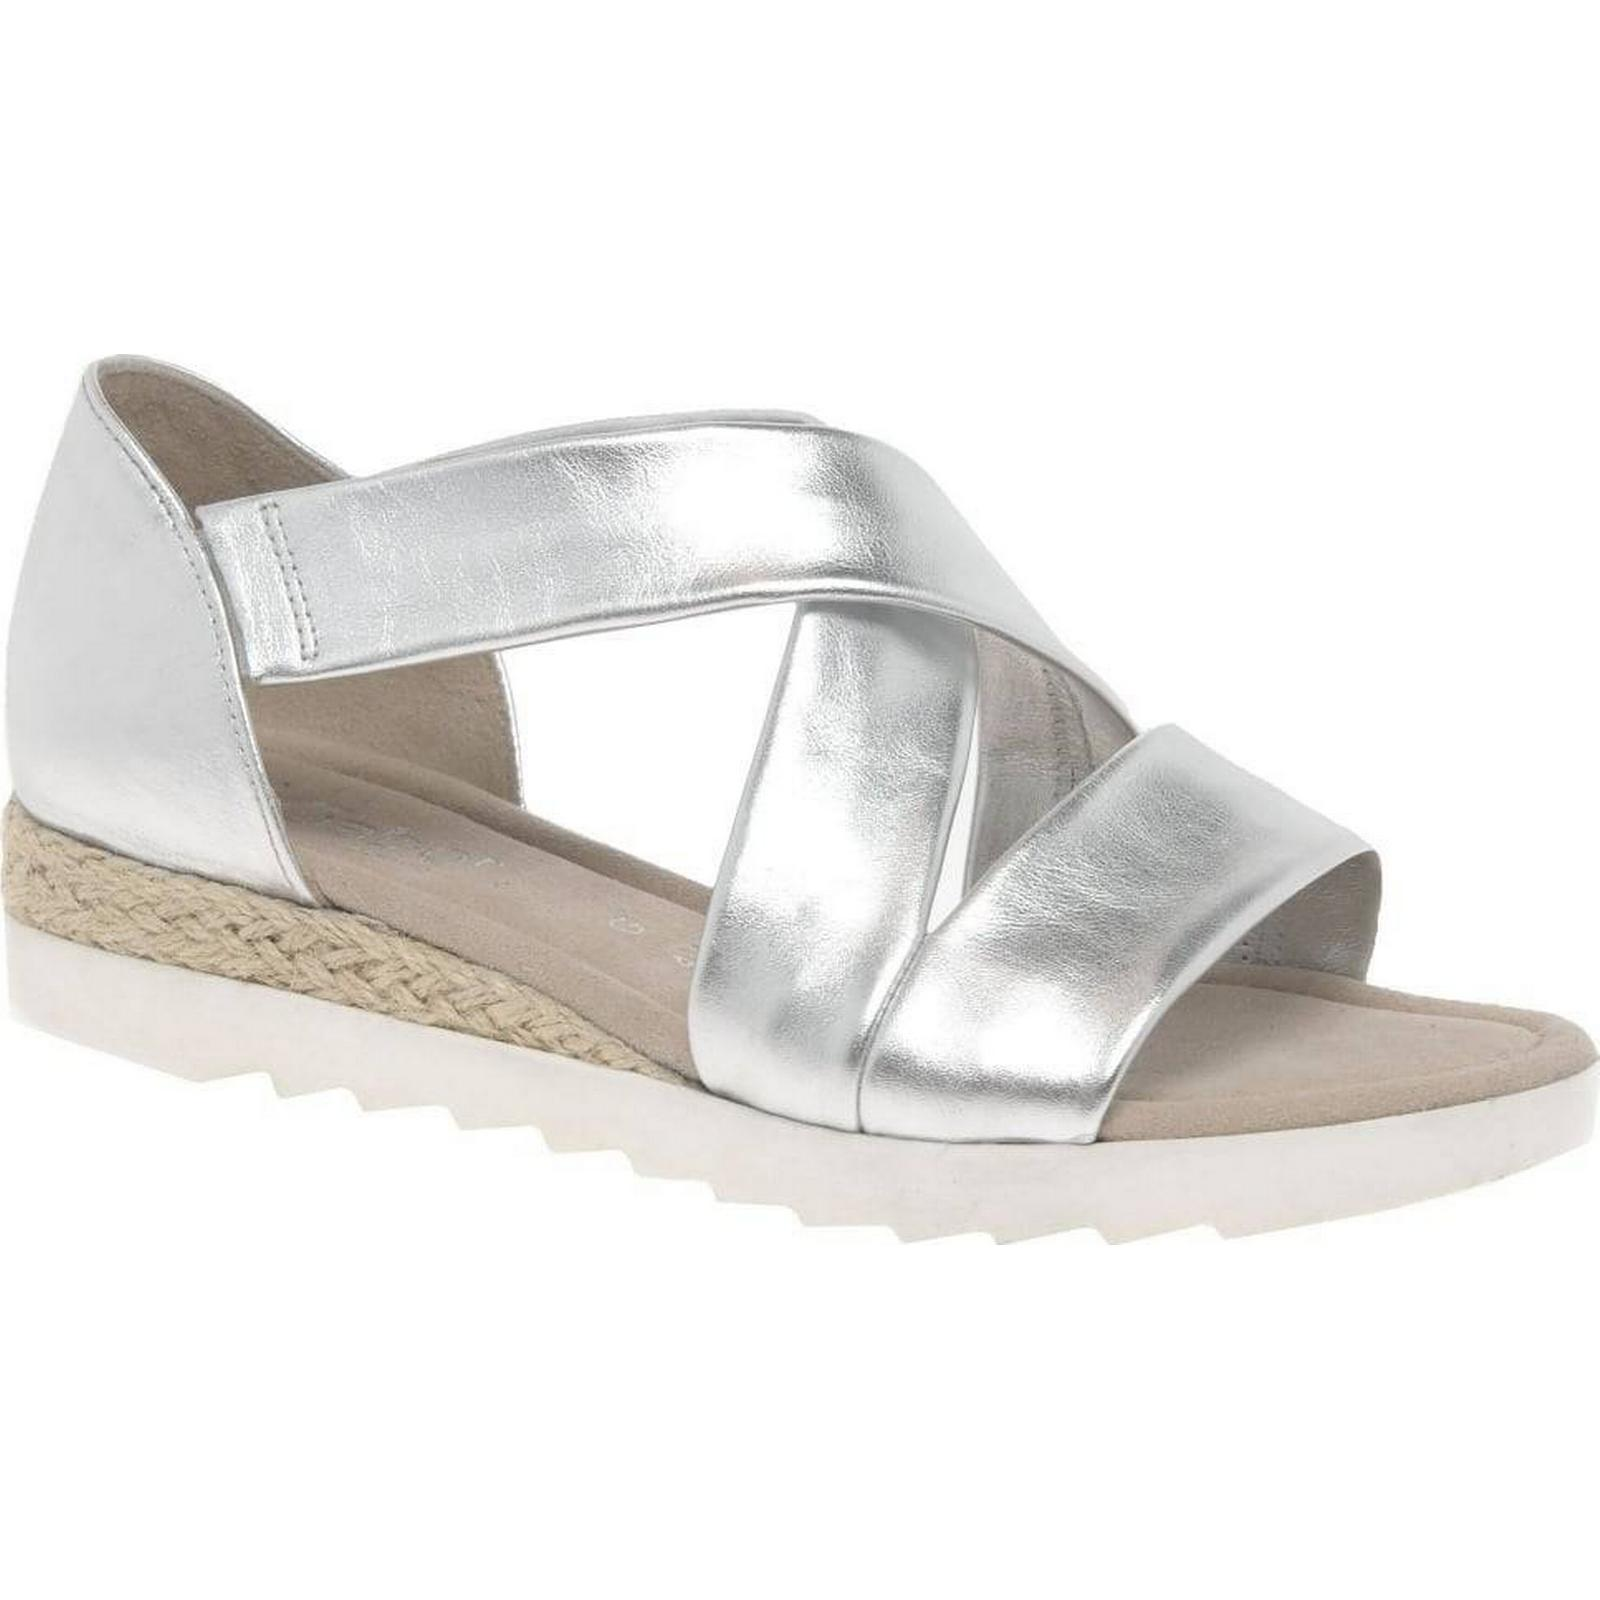 Gabor Promise Size: Womens Sandals Colour: Silver, Size: Promise 5.5 e8546a